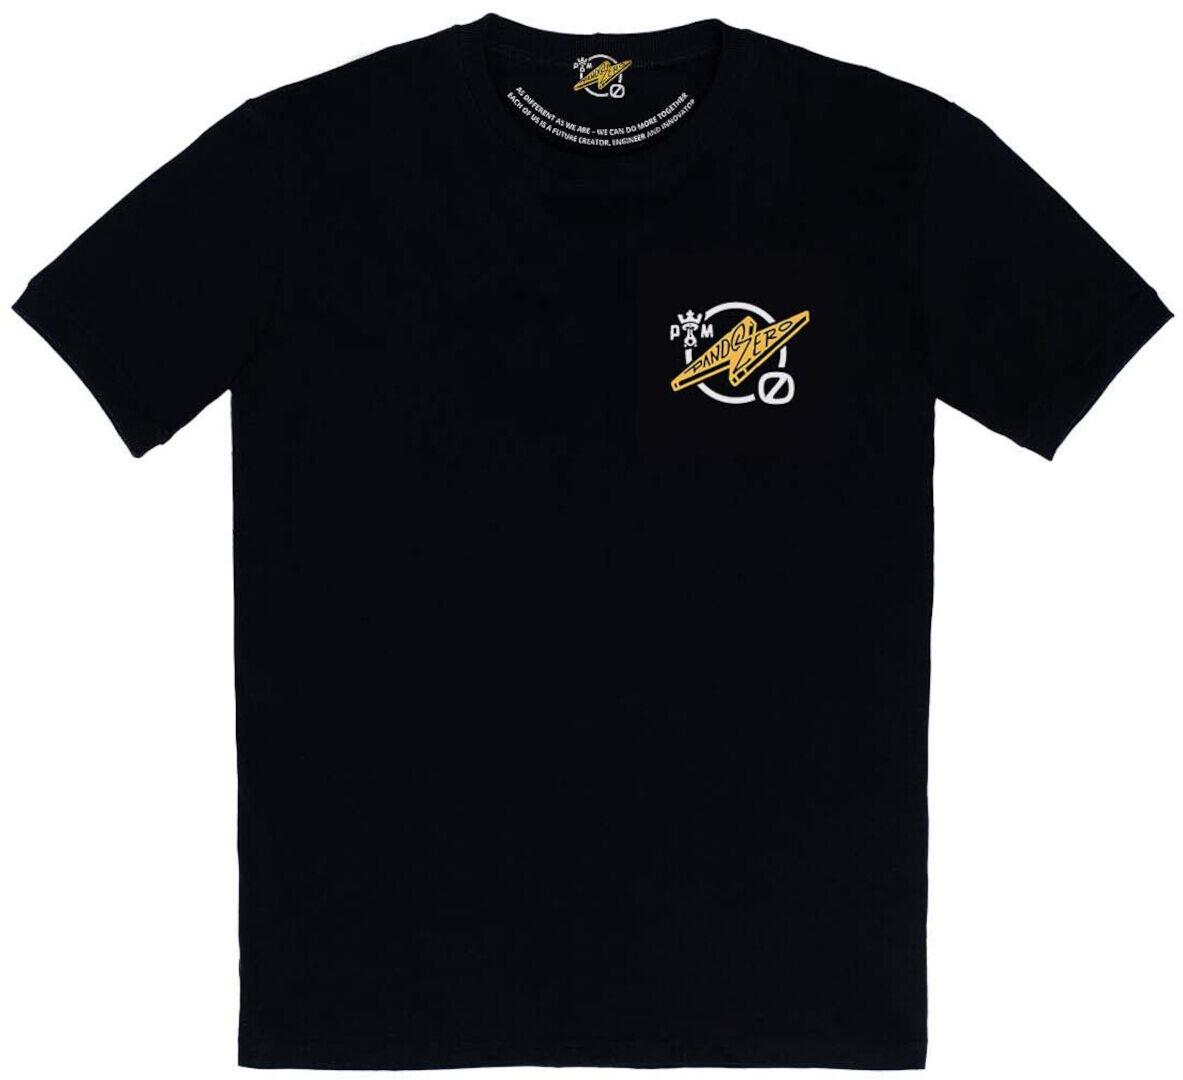 Pando Moto Mike Zero 1 t-shirt Noir taille : L